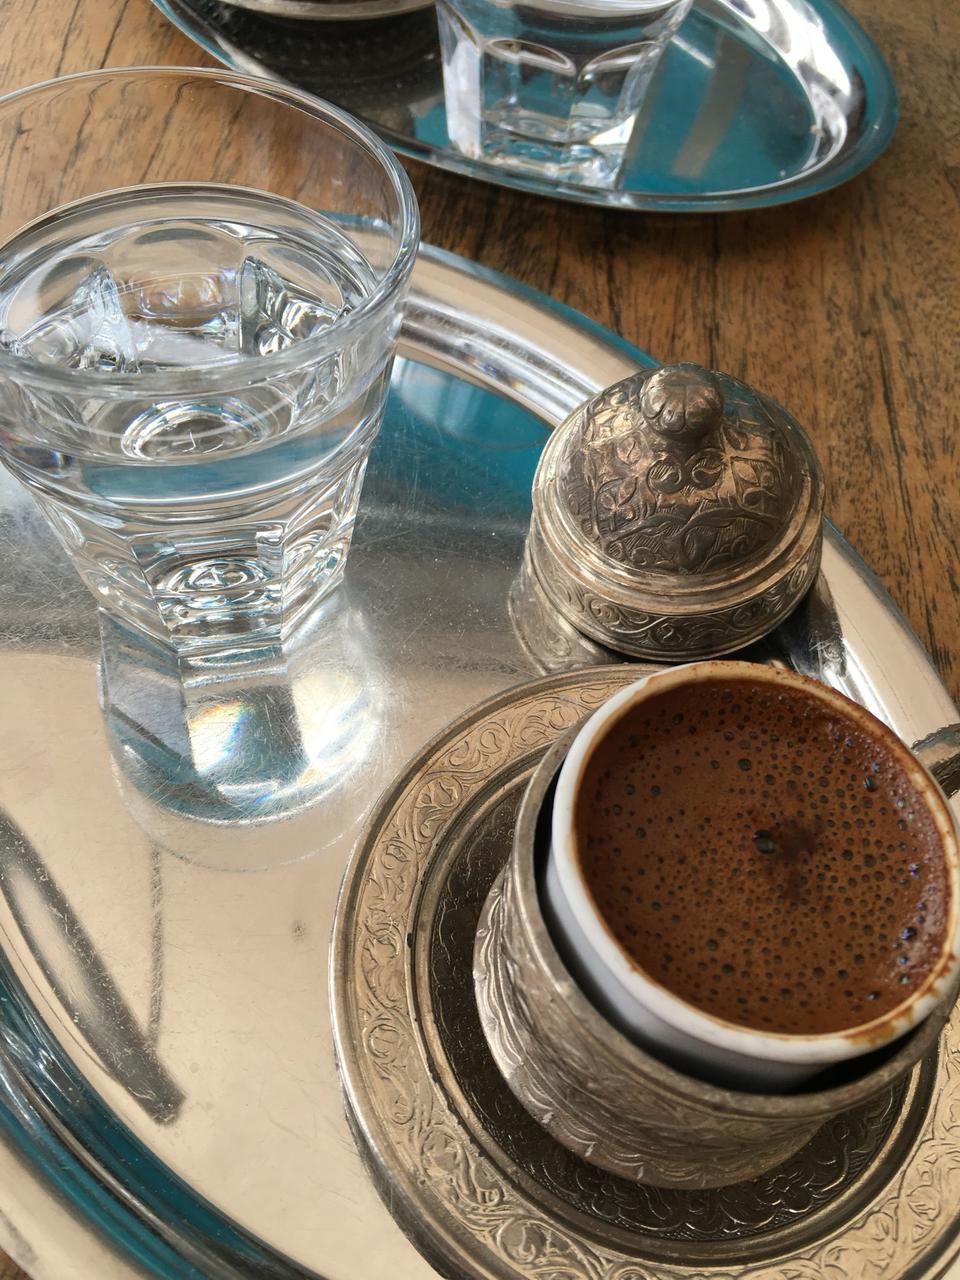 COFFEE OF THE DAY, COFFEE TIME, COFFEE BREAK, TURKISH